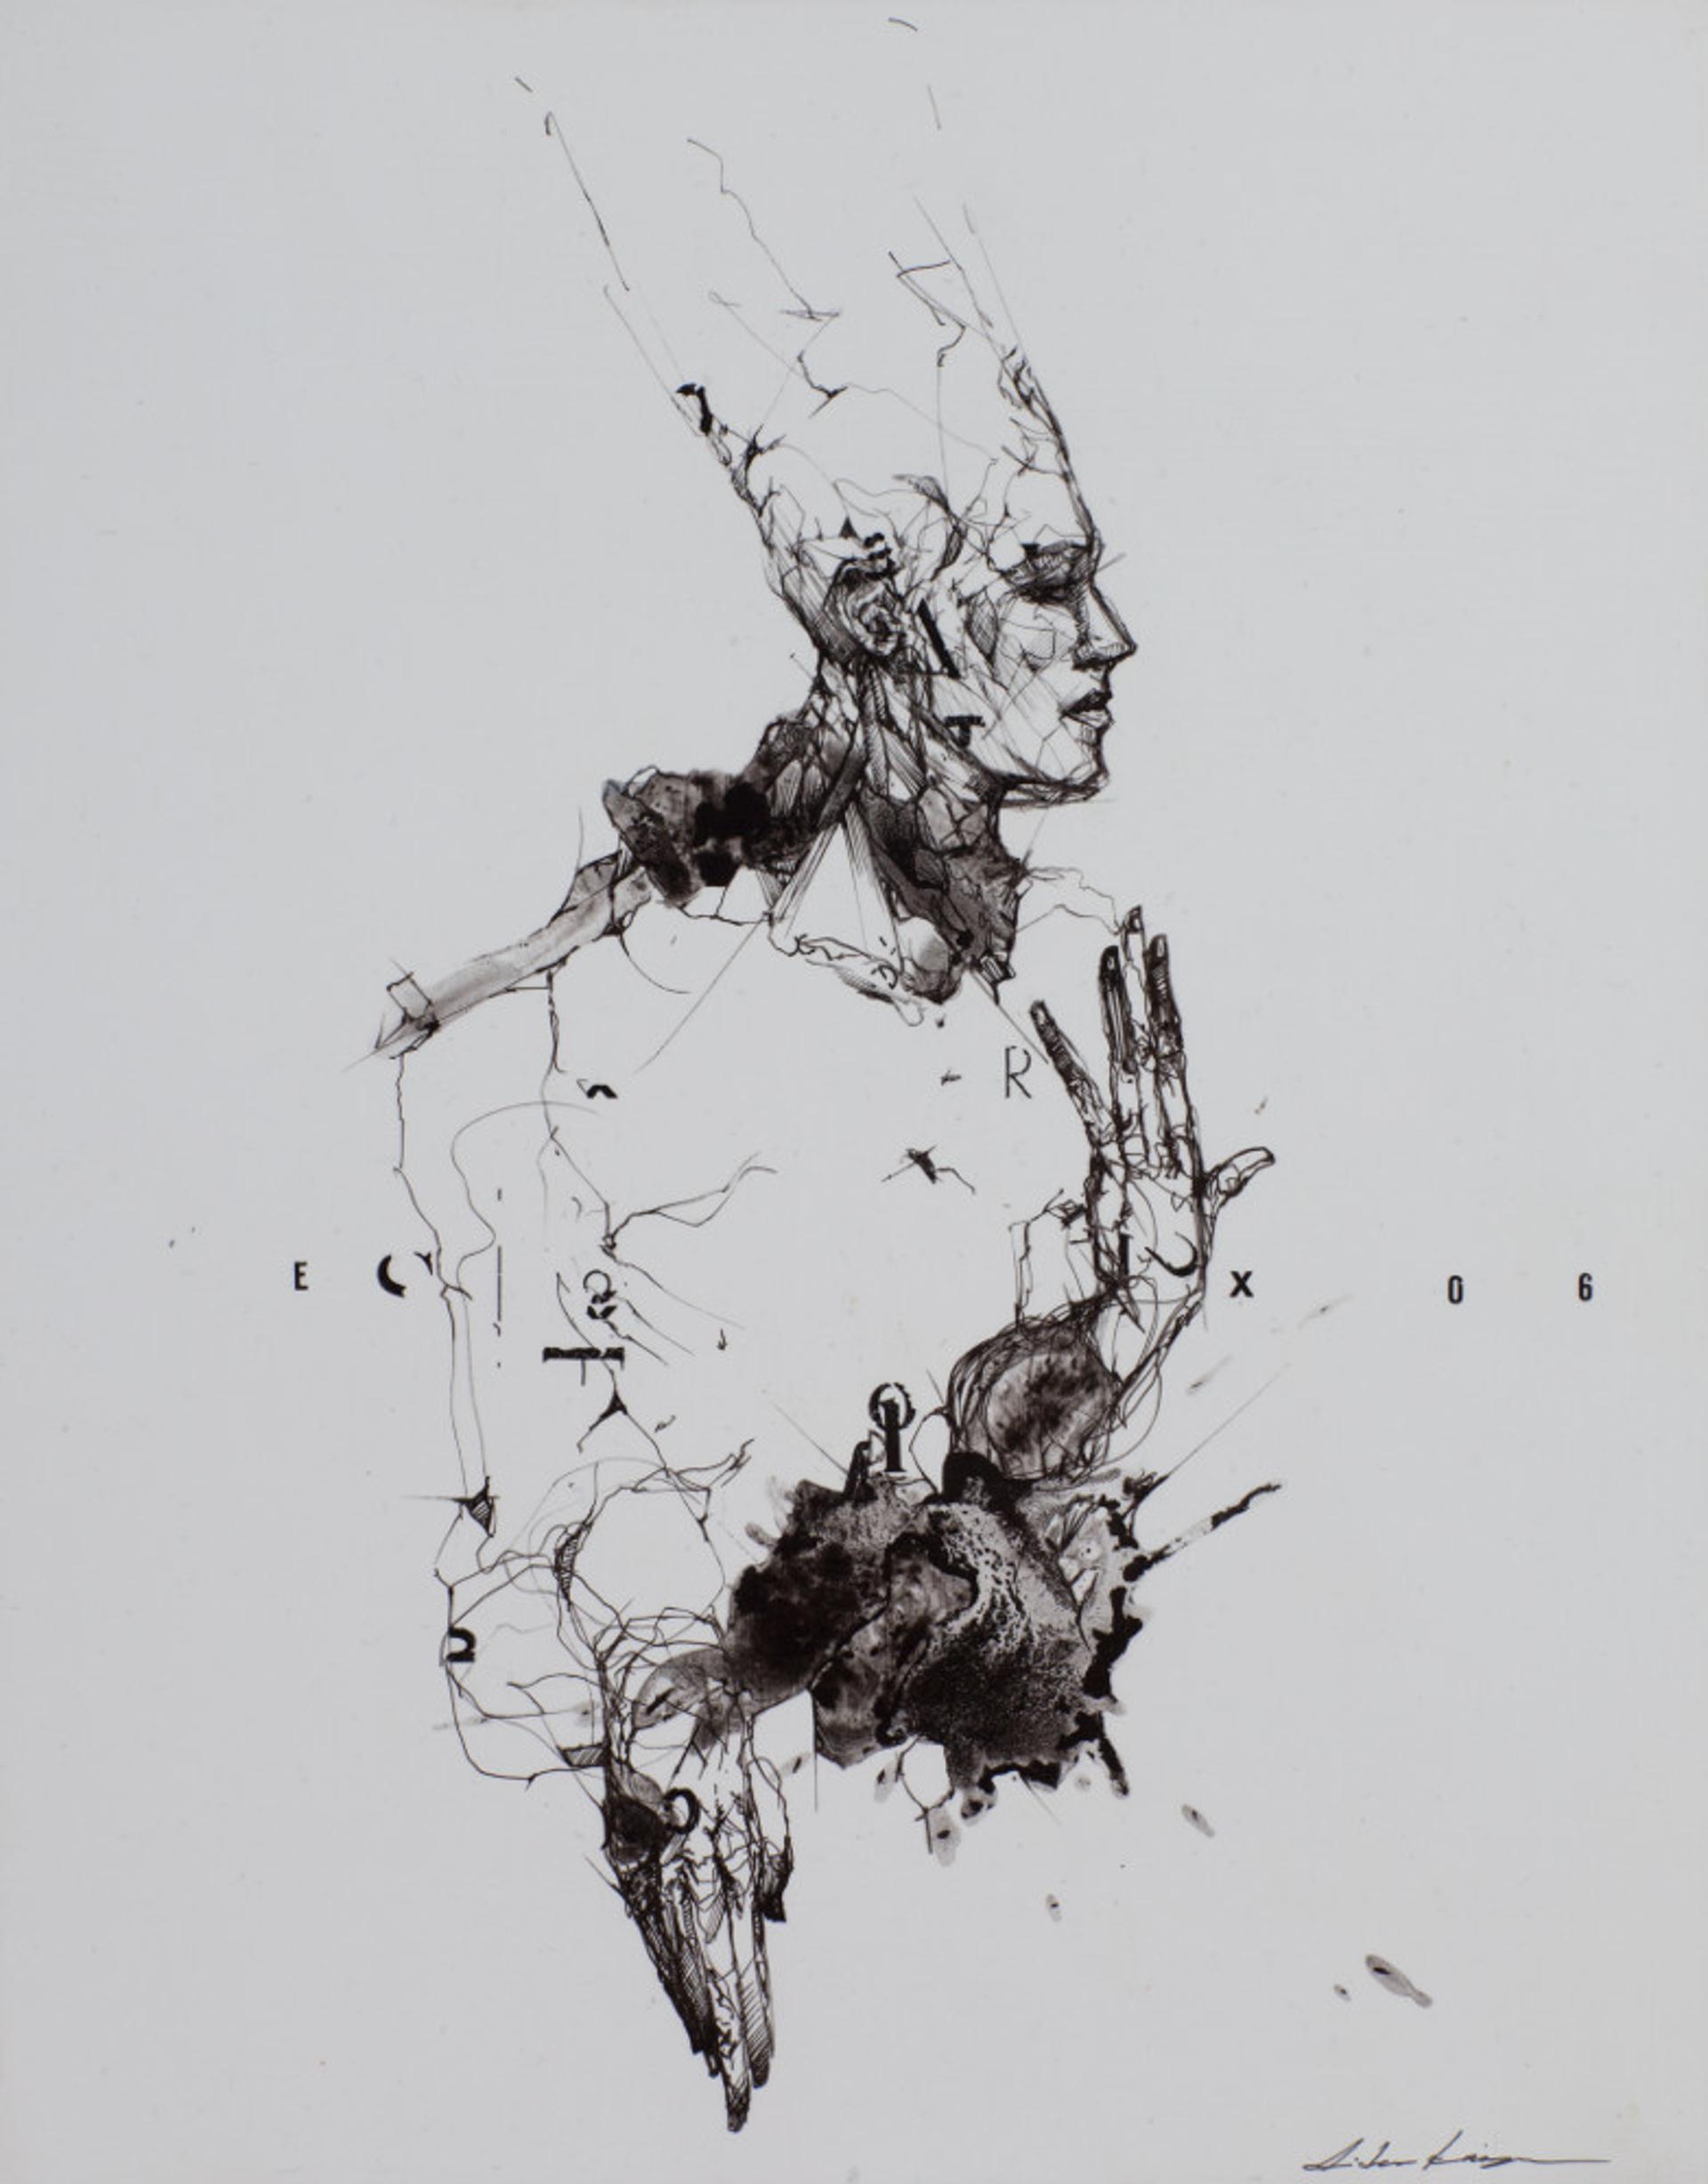 Allegory by Aiden Kringen